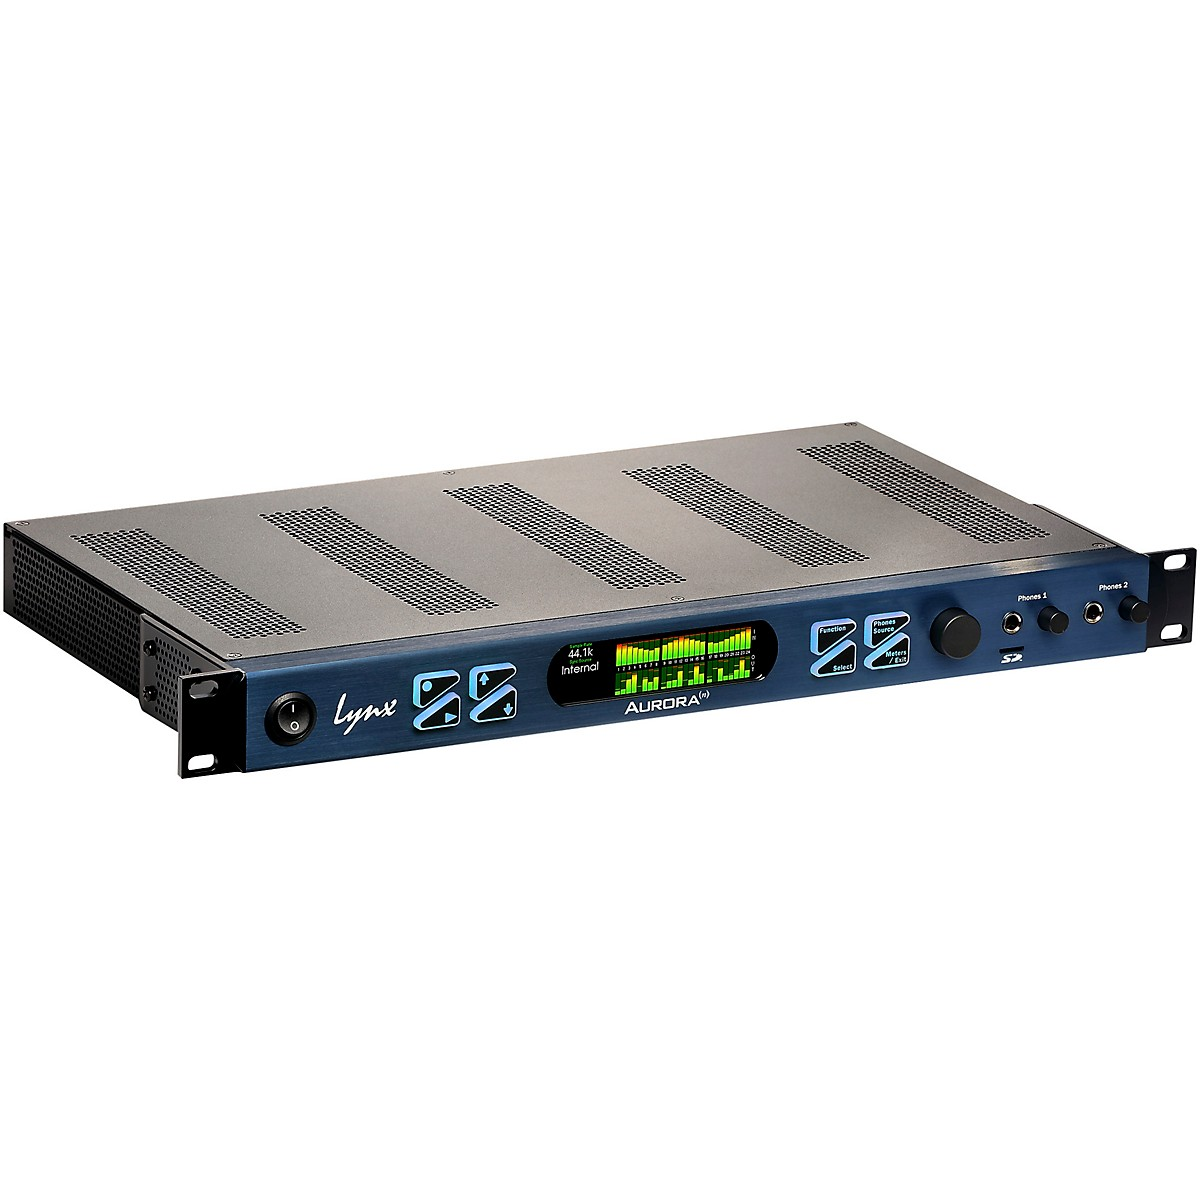 Lynx Aurora(n) 24 Thunderbolt Audio Interface